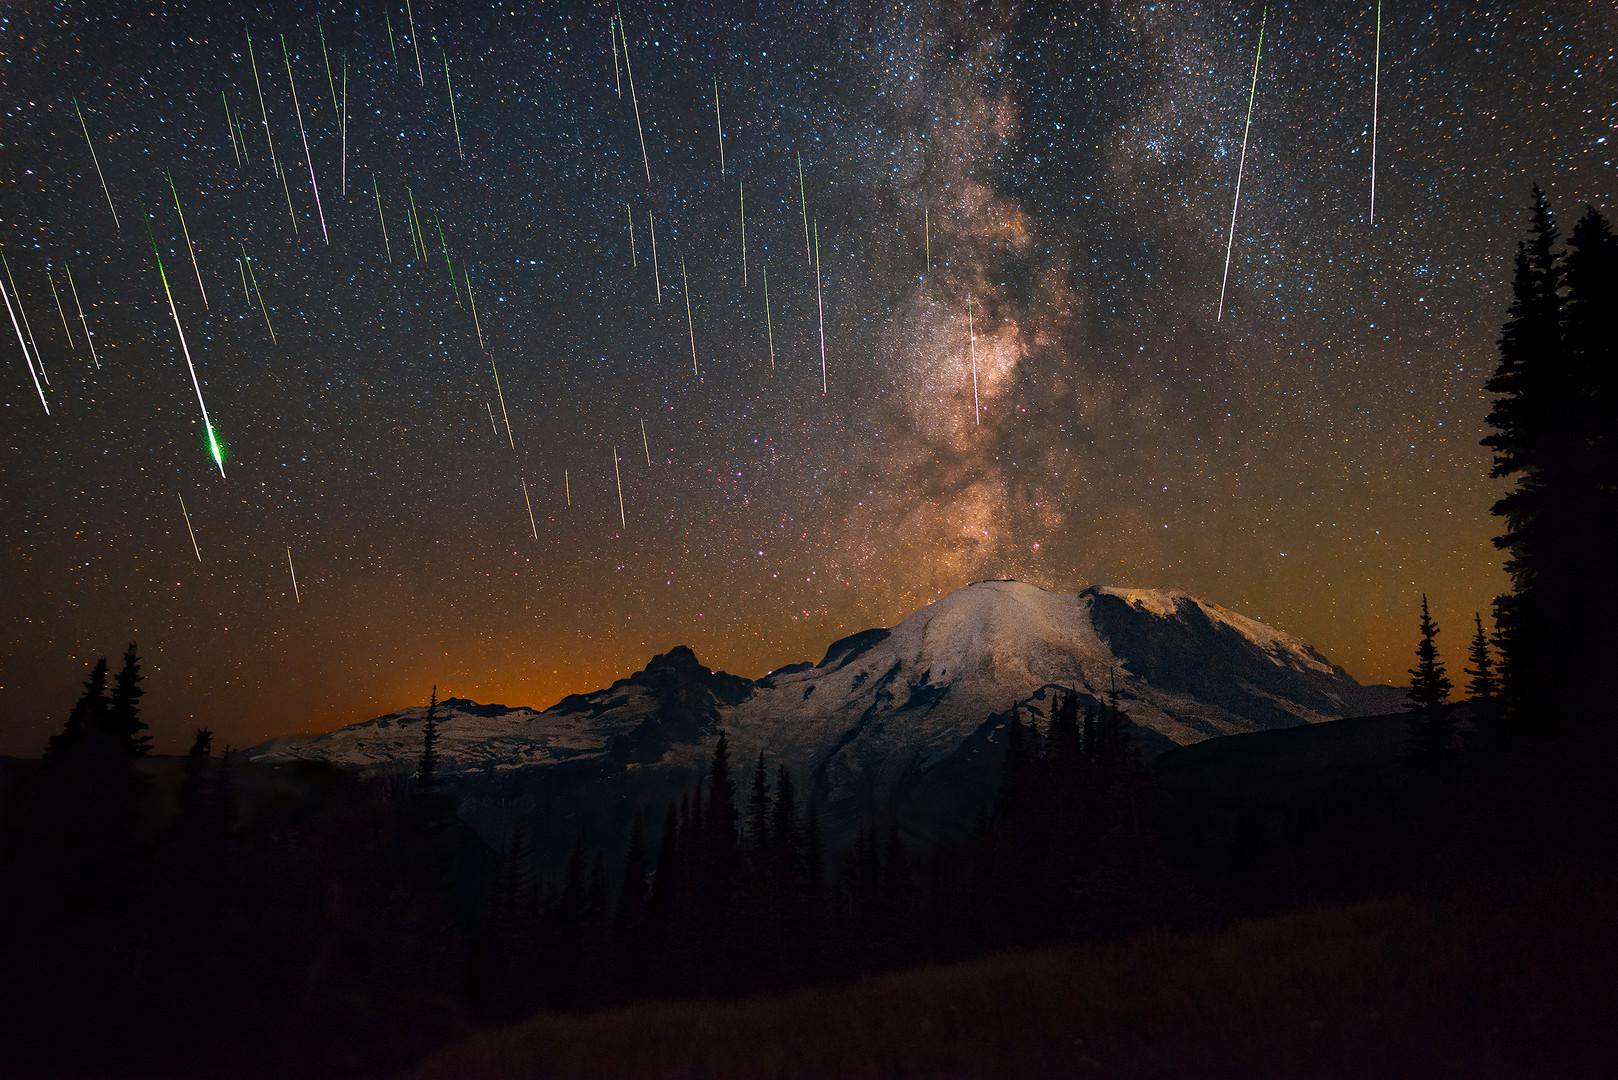 Perseid Meteors over Mount Rainier